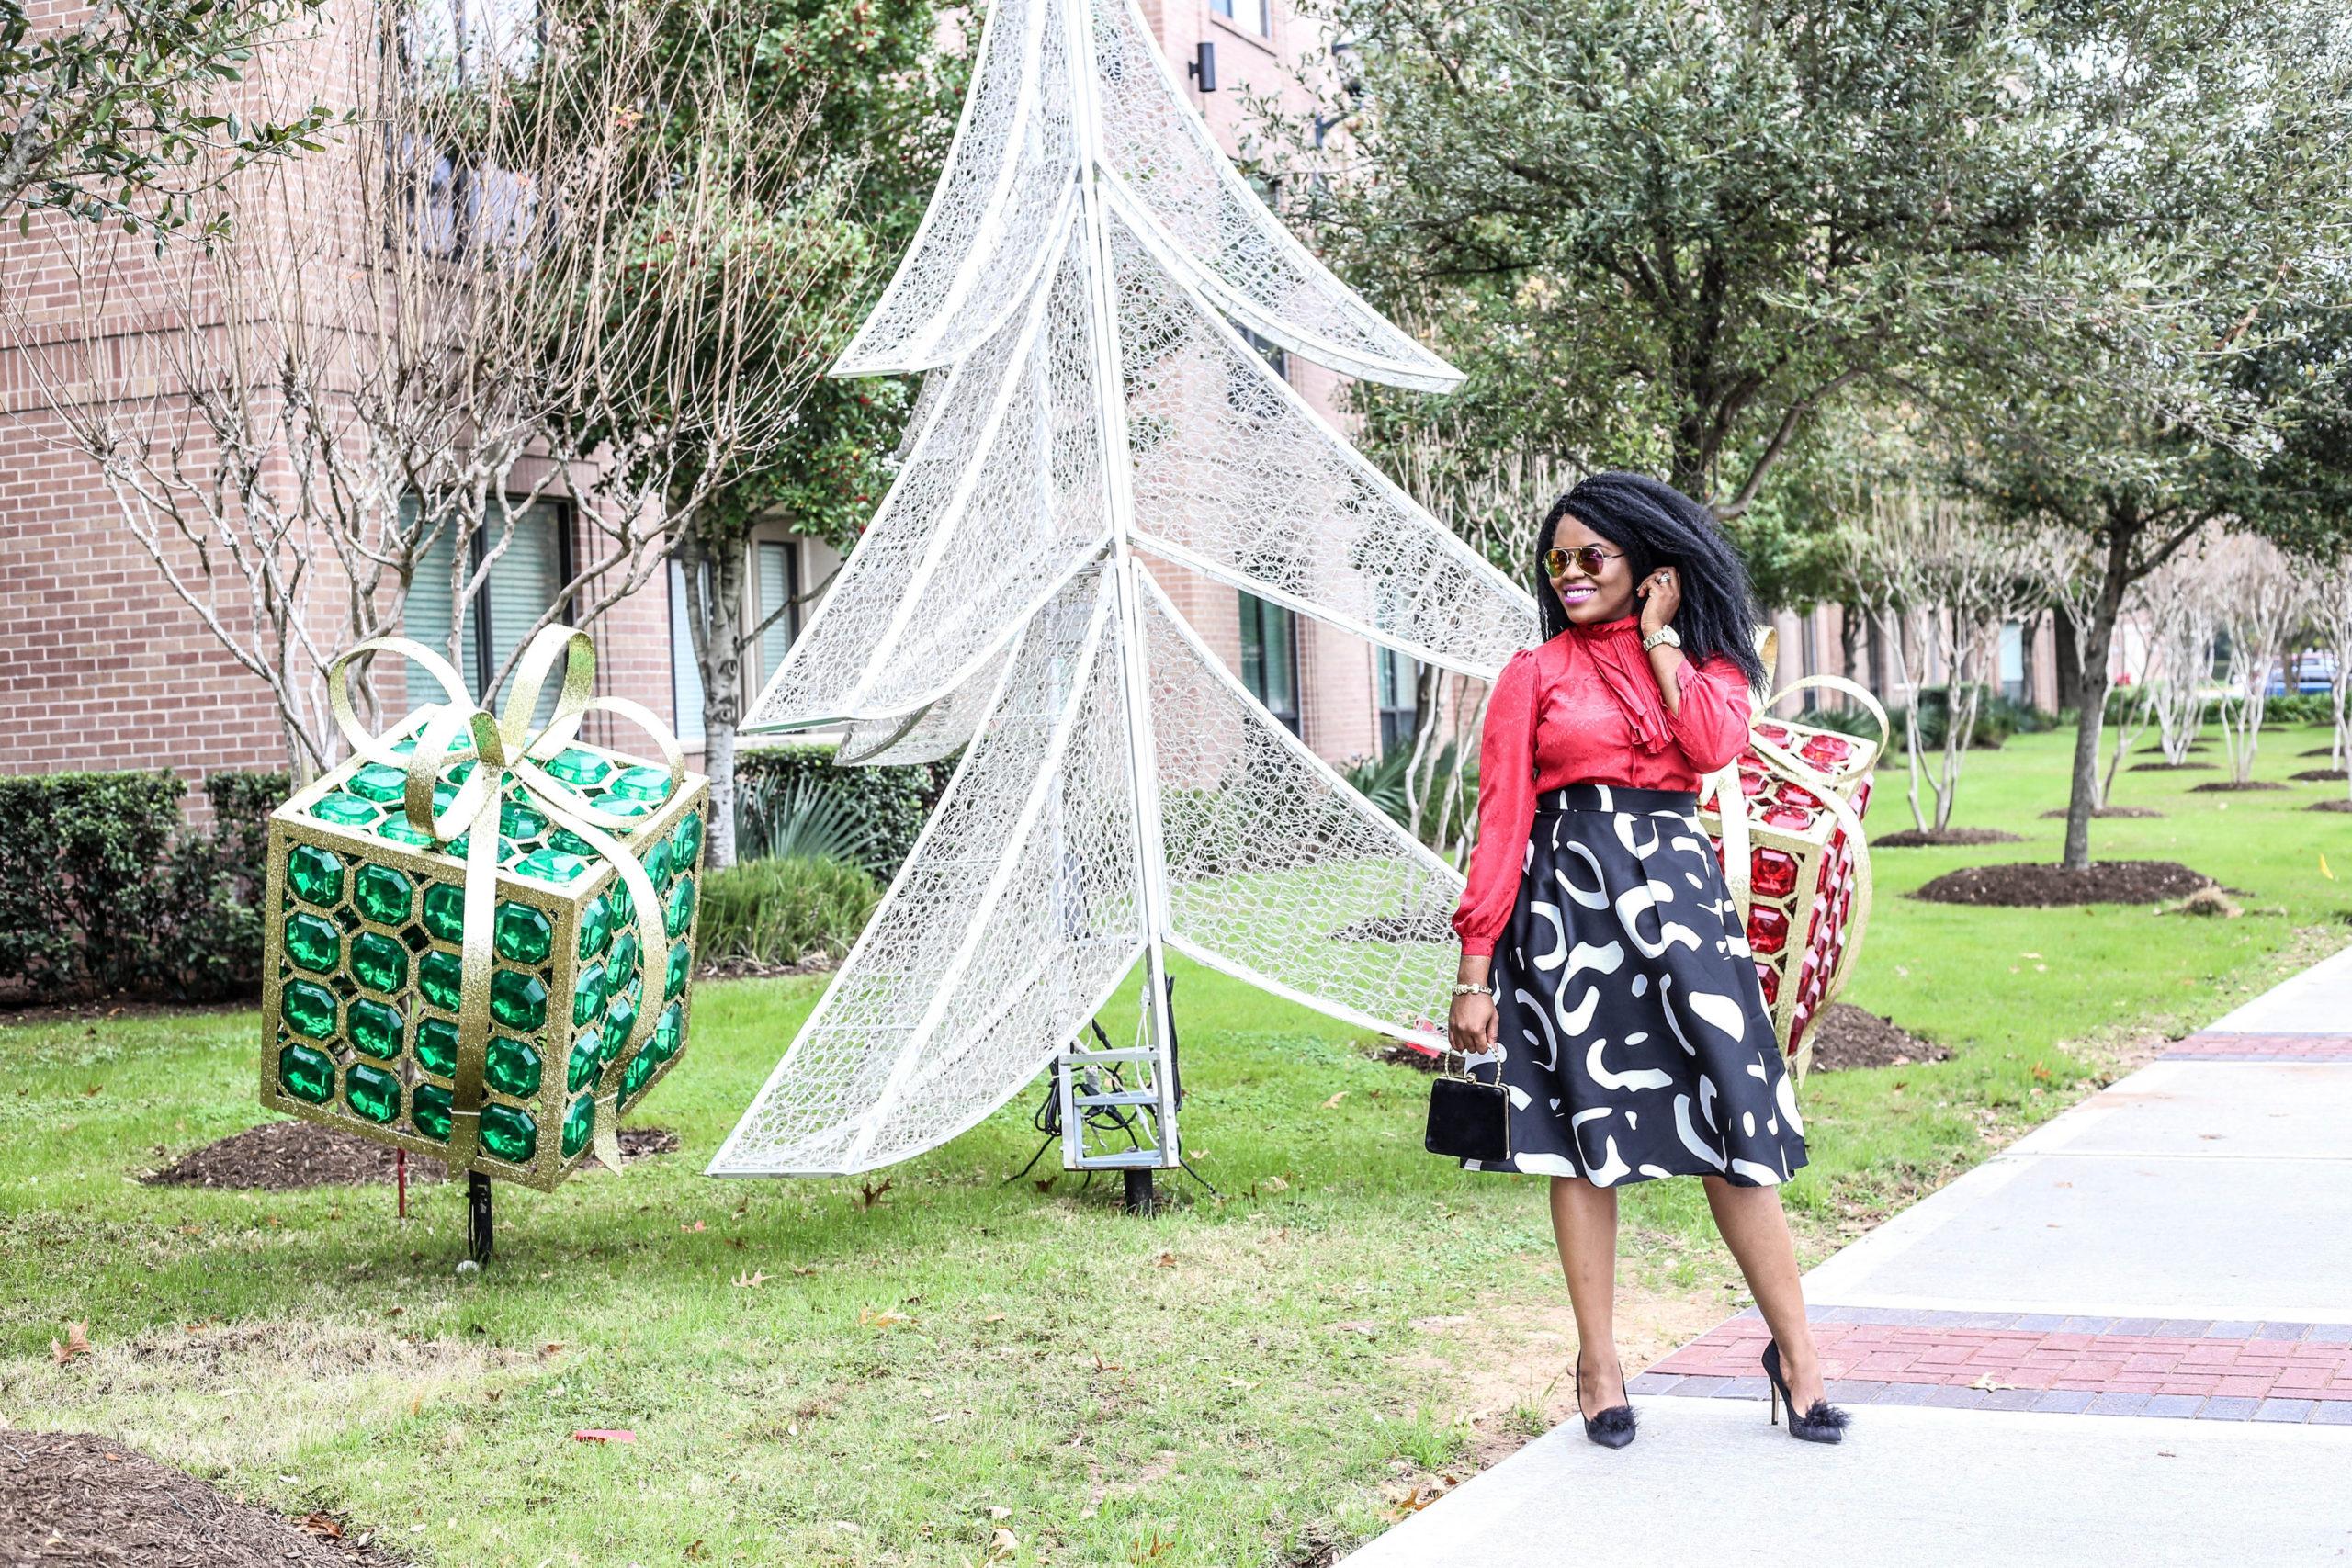 Retro Chic ChigisWorld Vintage High Neck Ruffled Top SheIn Aline Pleated Midi Skirt Betsey Johnson Black Feather Pumps Ross Velvet Clutch Handbag Agaci Sunglasses